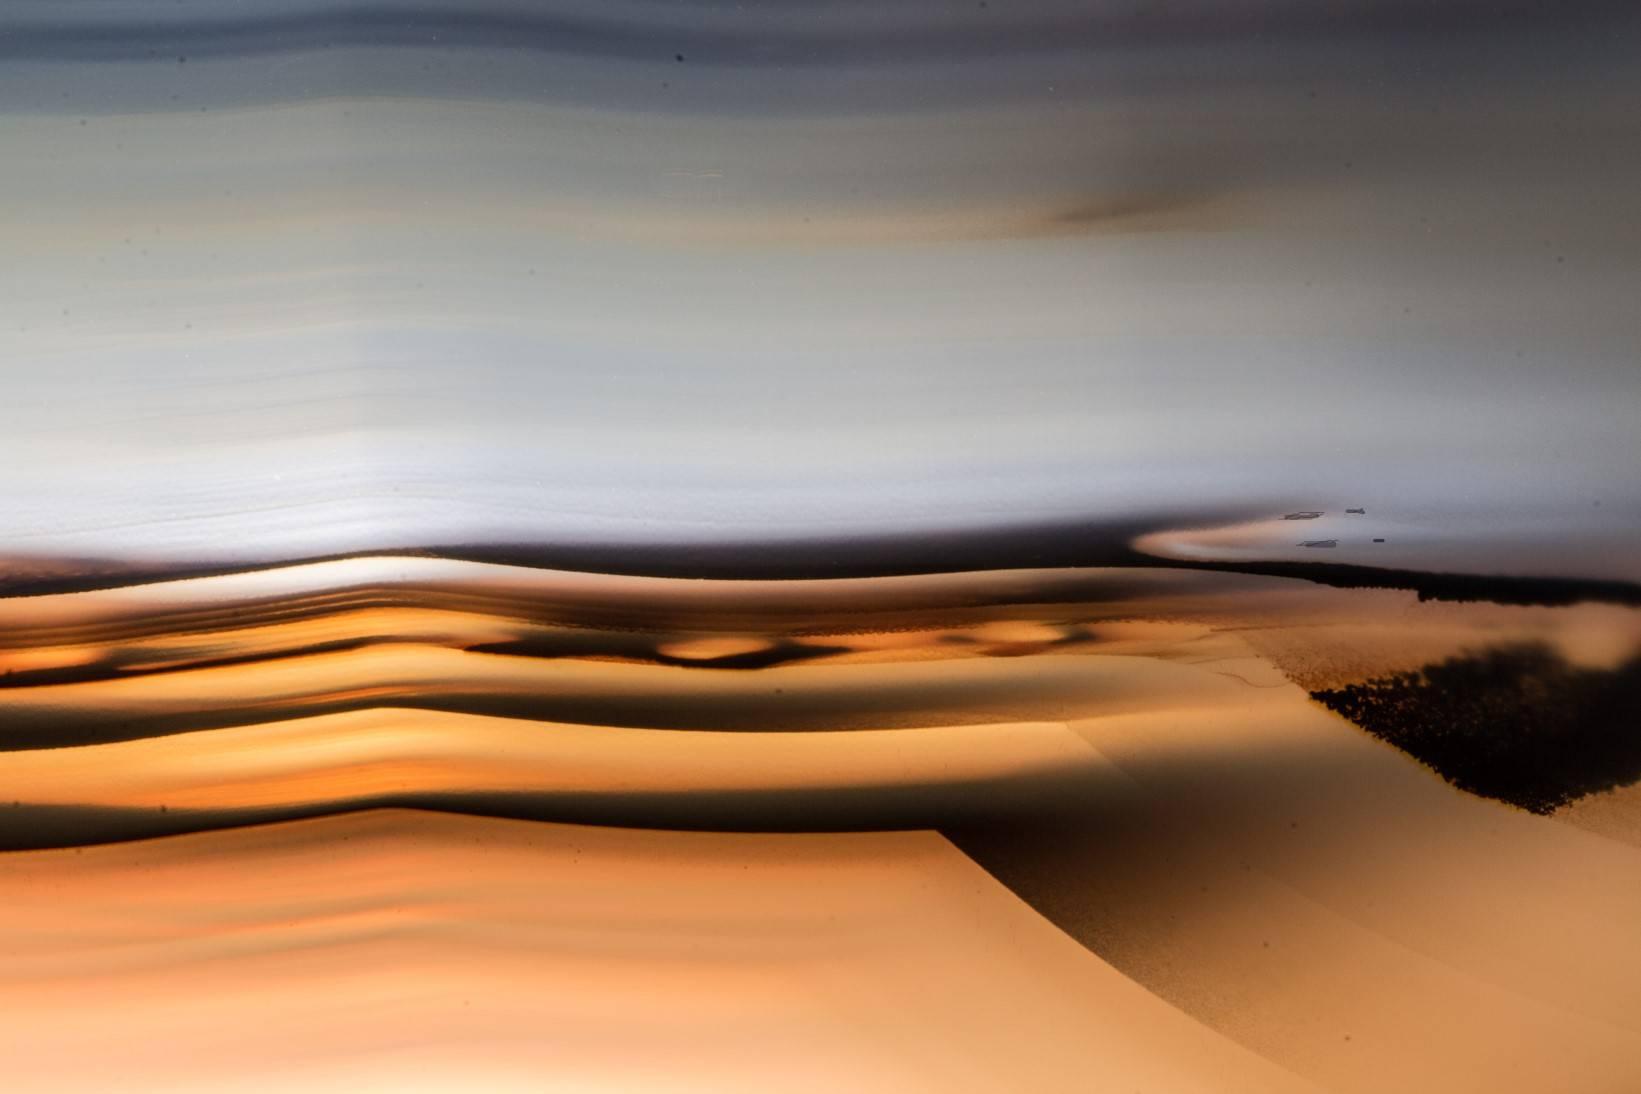 Sand Life ripples